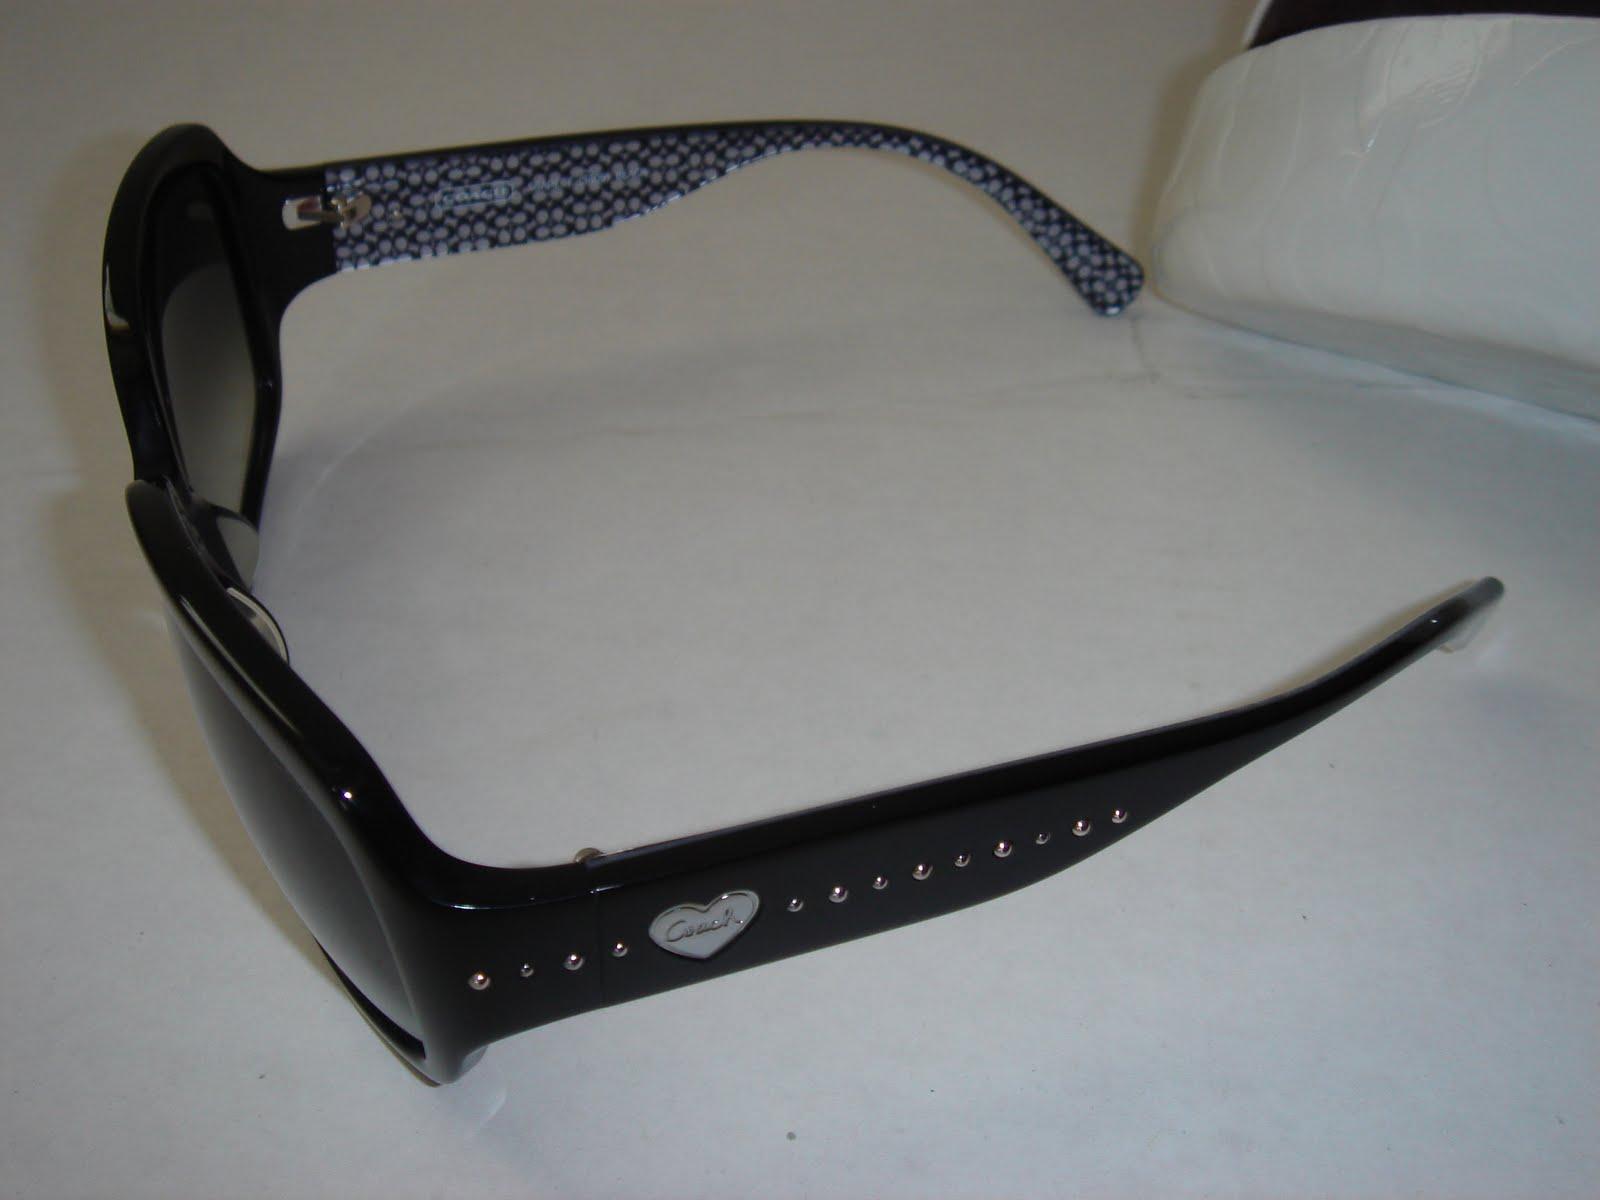 29b9539c9f ... discount code for coach scarlet gradient sunglasses s809 8f9e9 e8d64